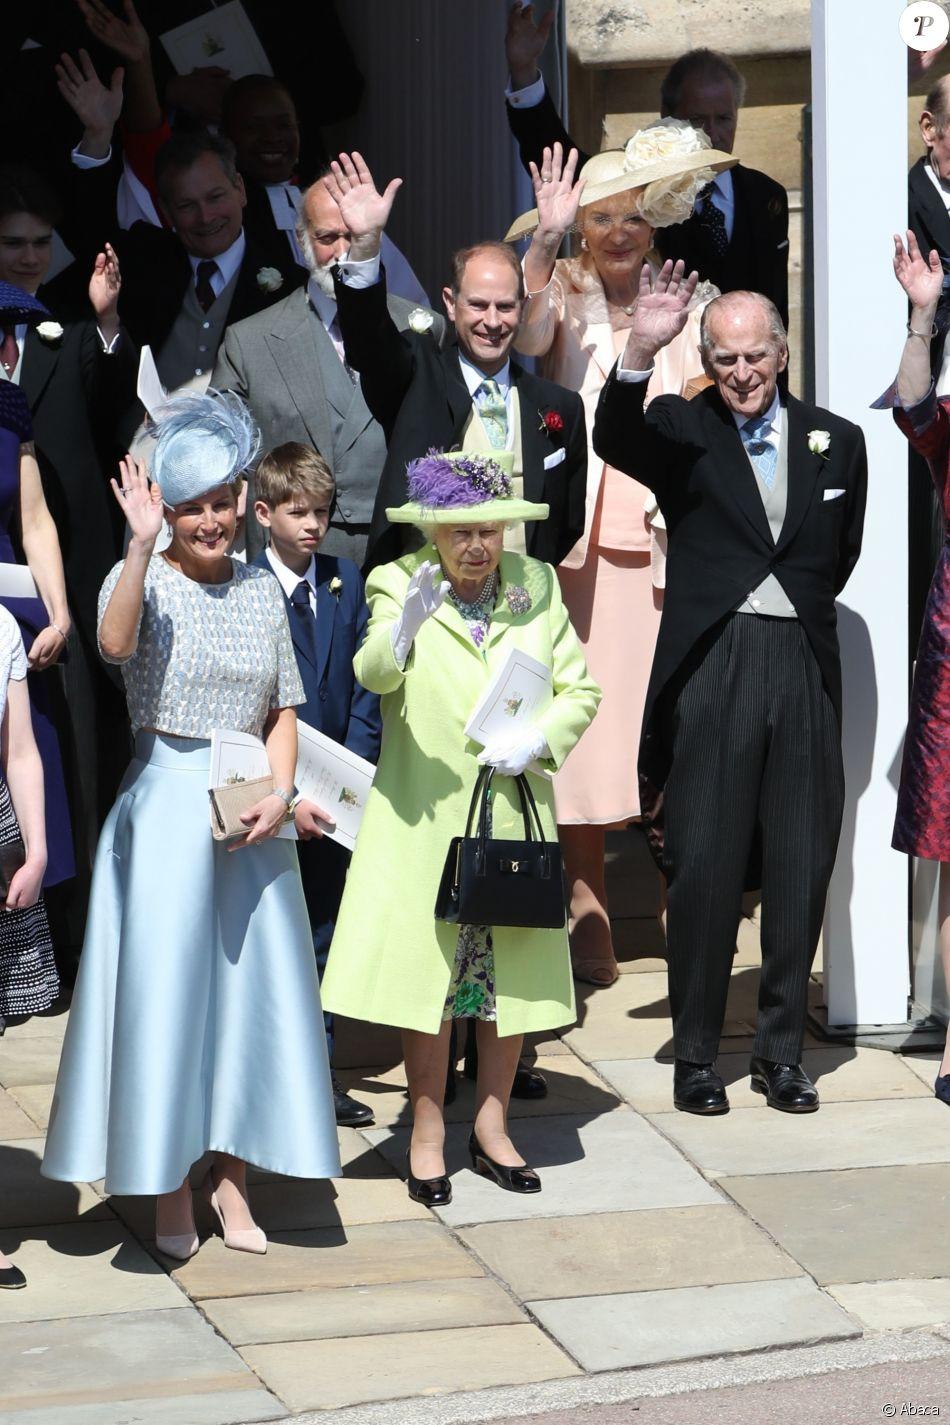 La reine Elizabeth II et le duc d\u0027Edimbourg au mariage du prince Harry et  de Meghan Markle le 19 mai 2018 à Windsor.